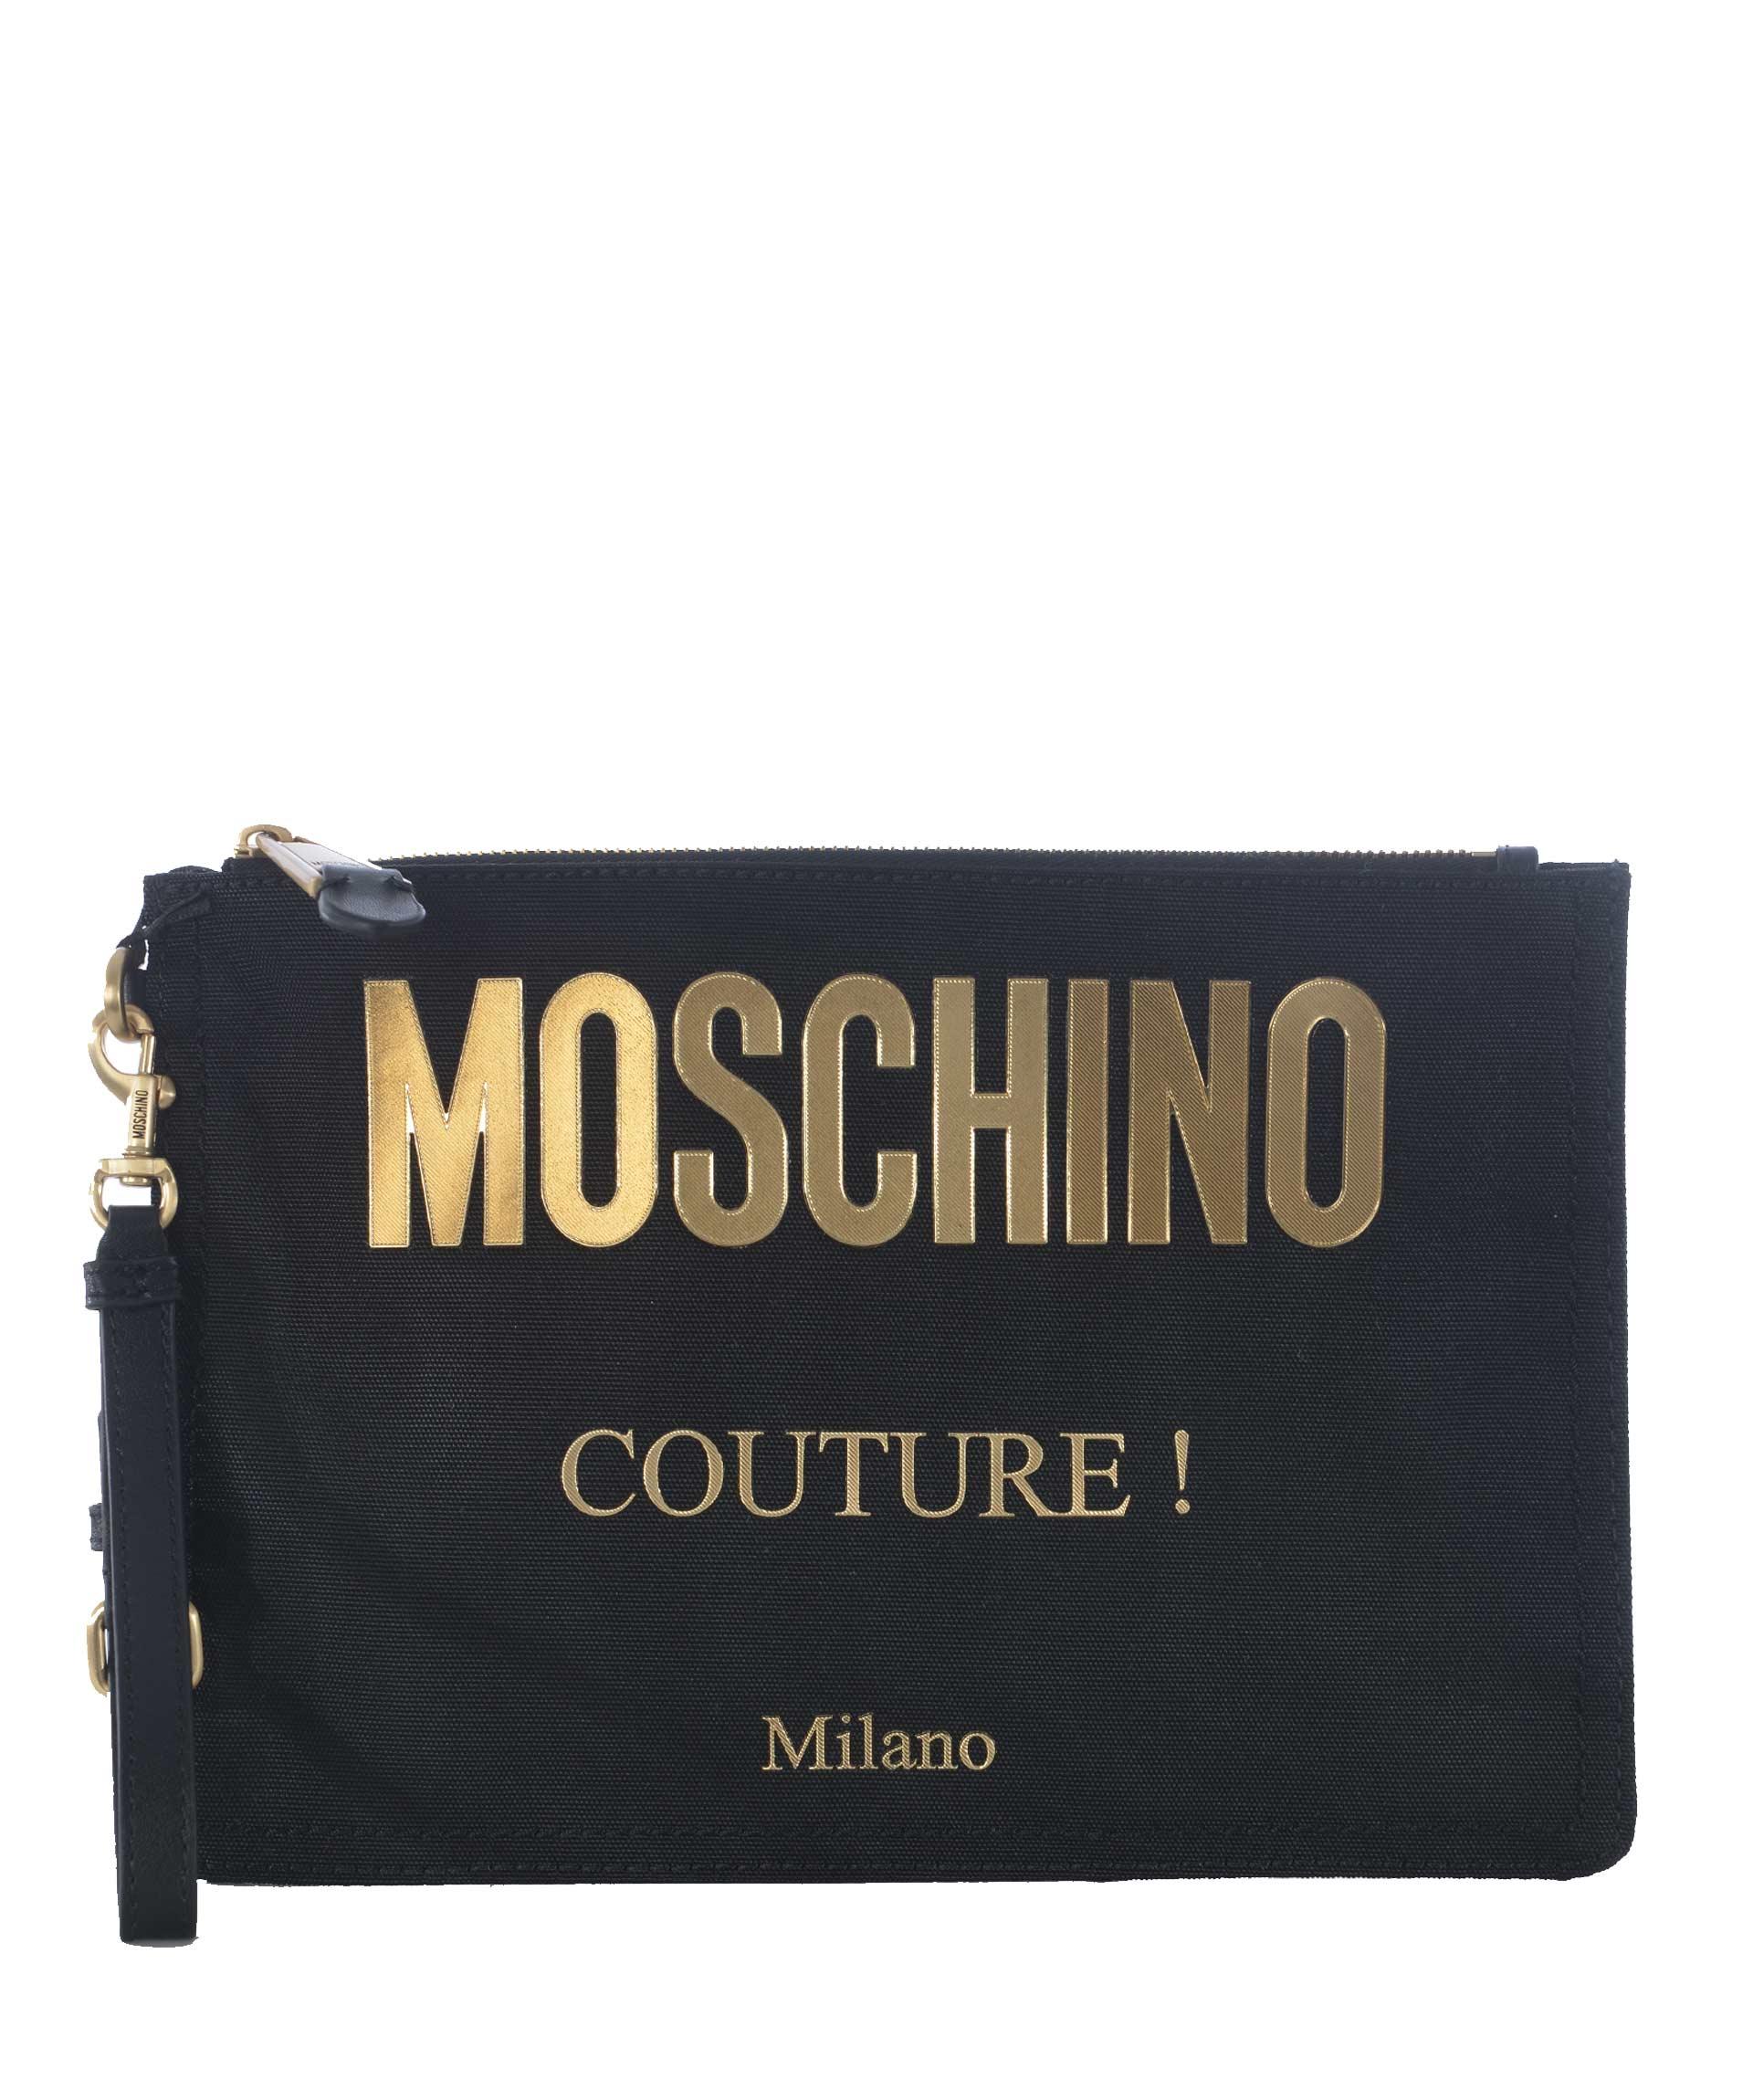 Bustina Moschino in tela di nylon